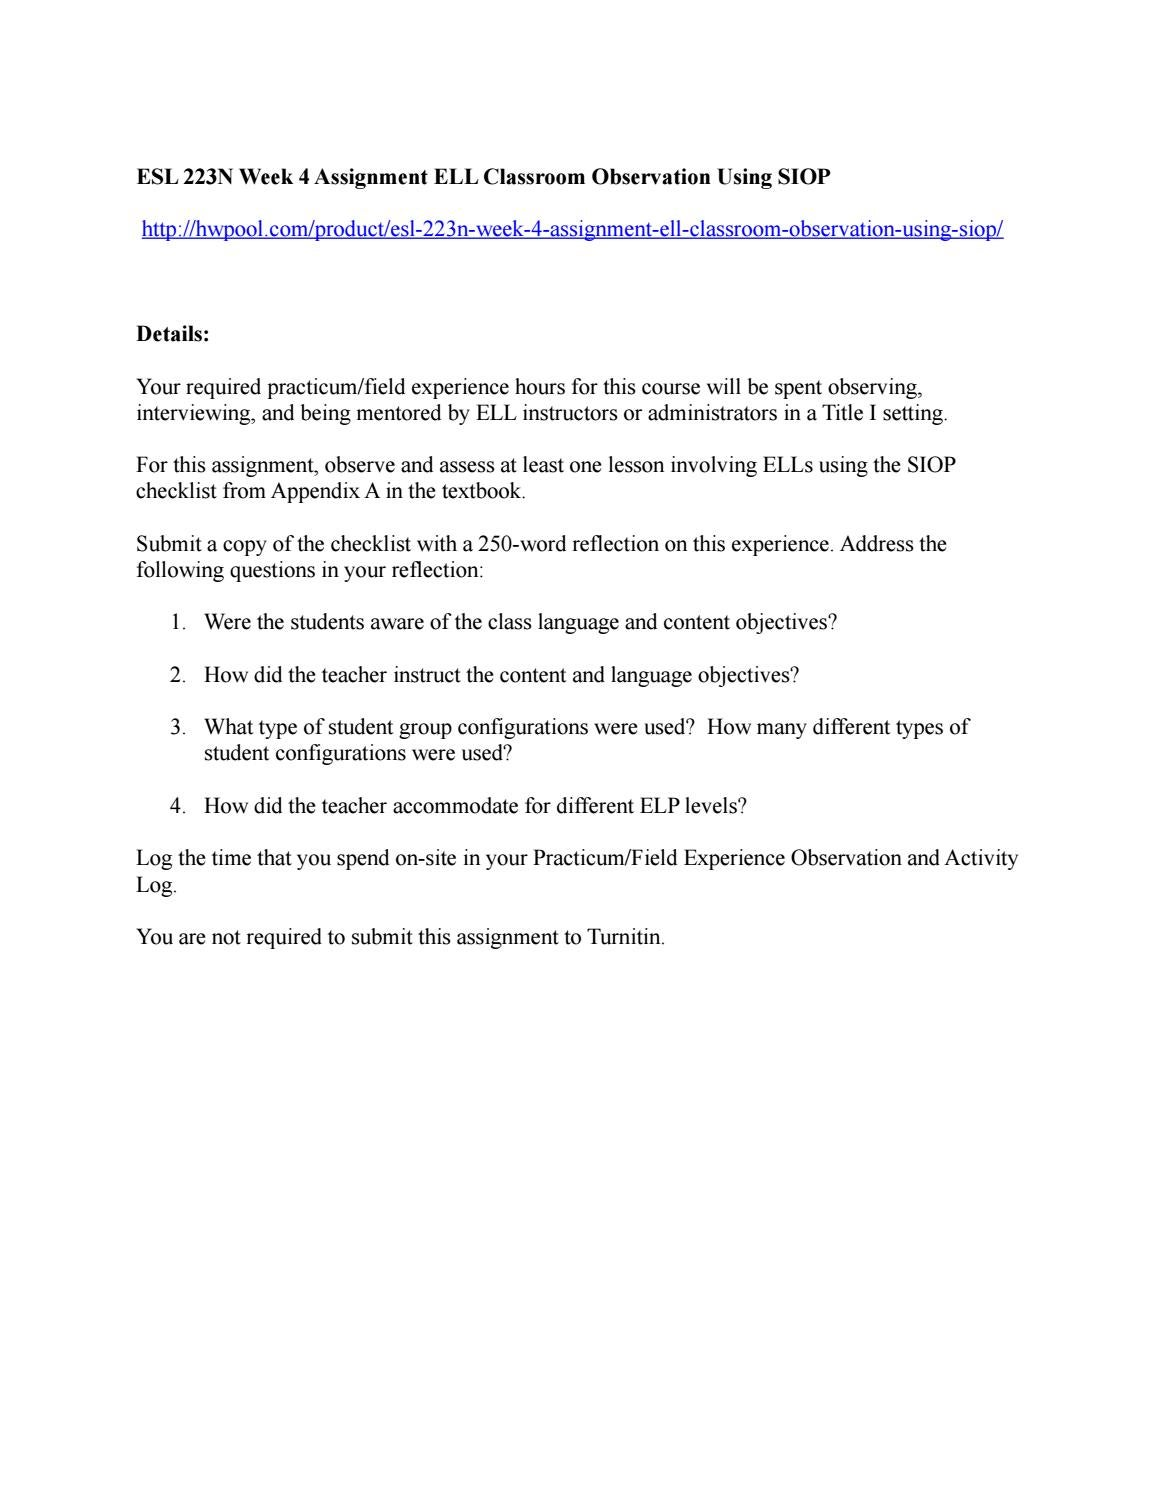 Esl 223n week 4 assignment ell classroom observation using